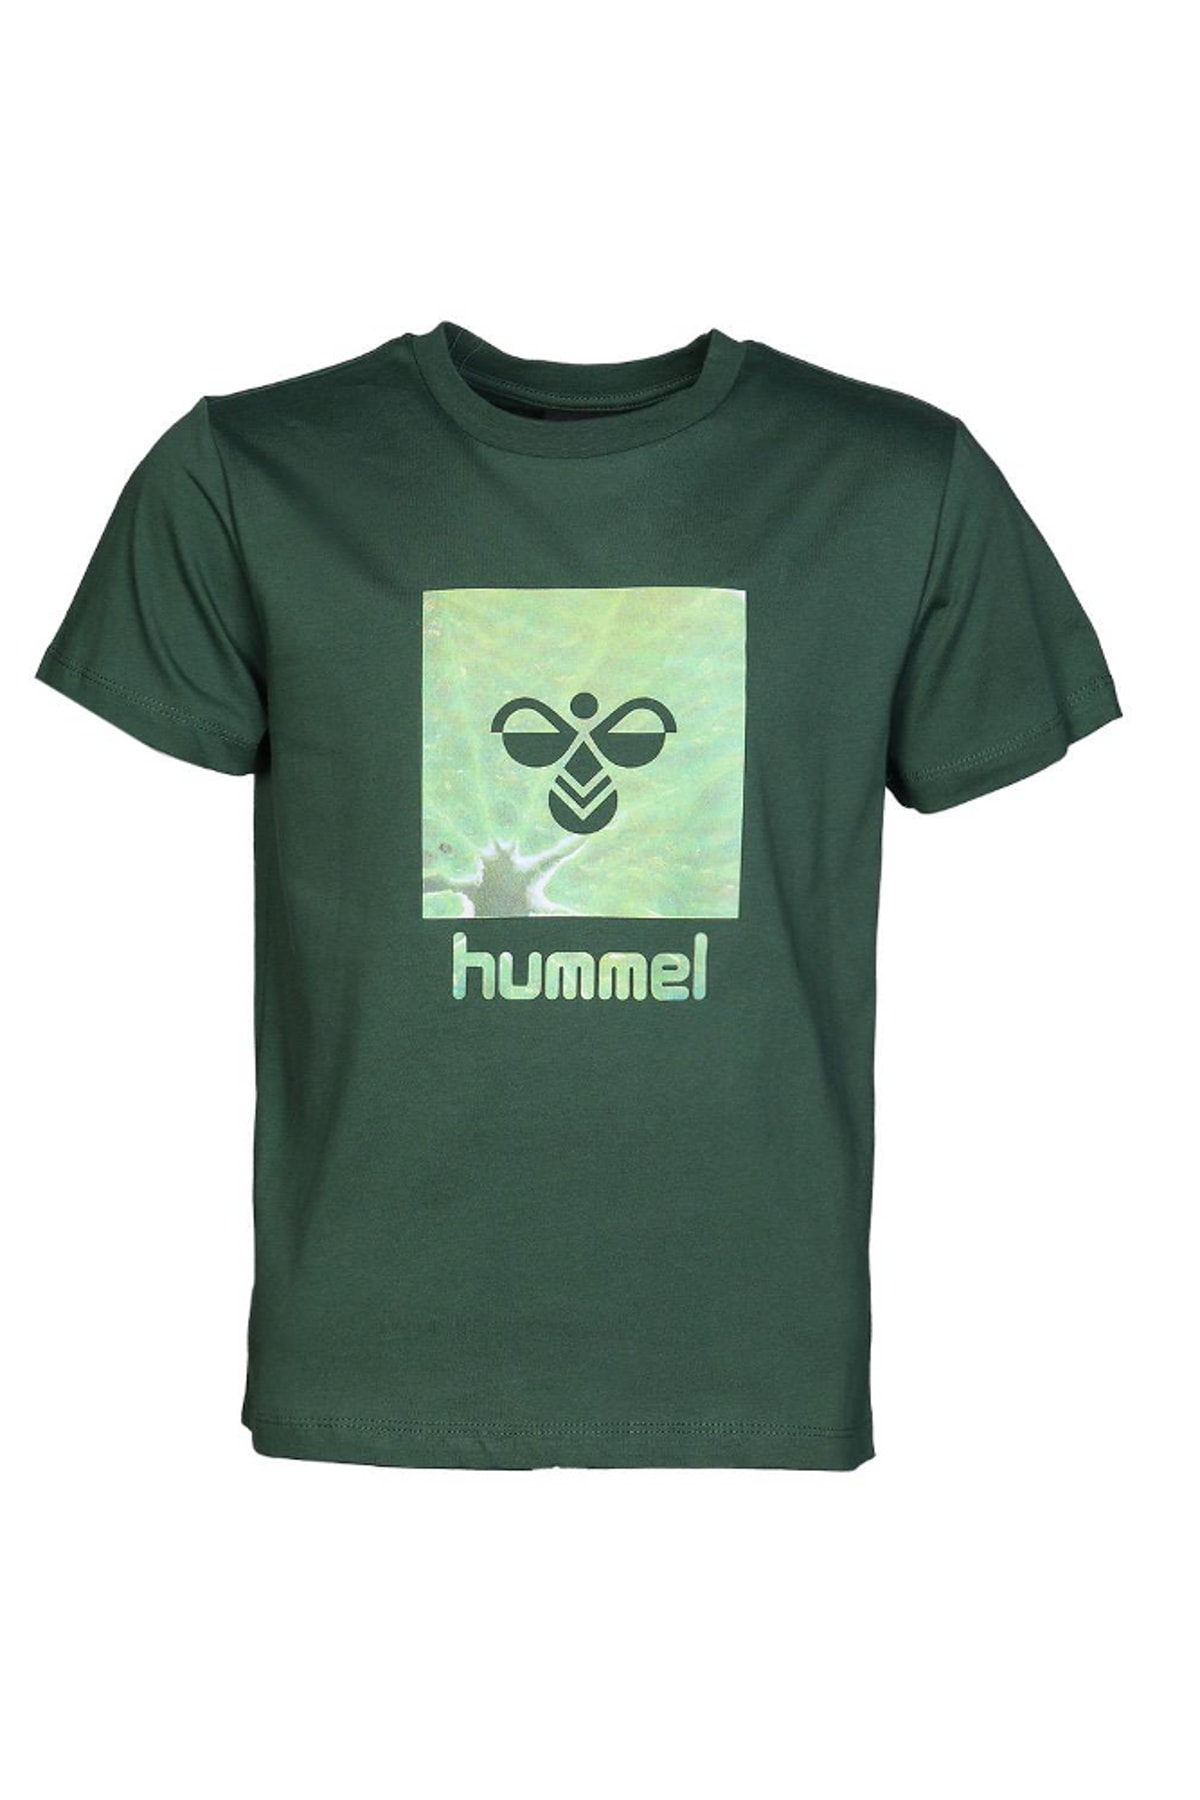 HUMMEL KIDS HML ISAGOR T-SHIRT S/S TEE 2